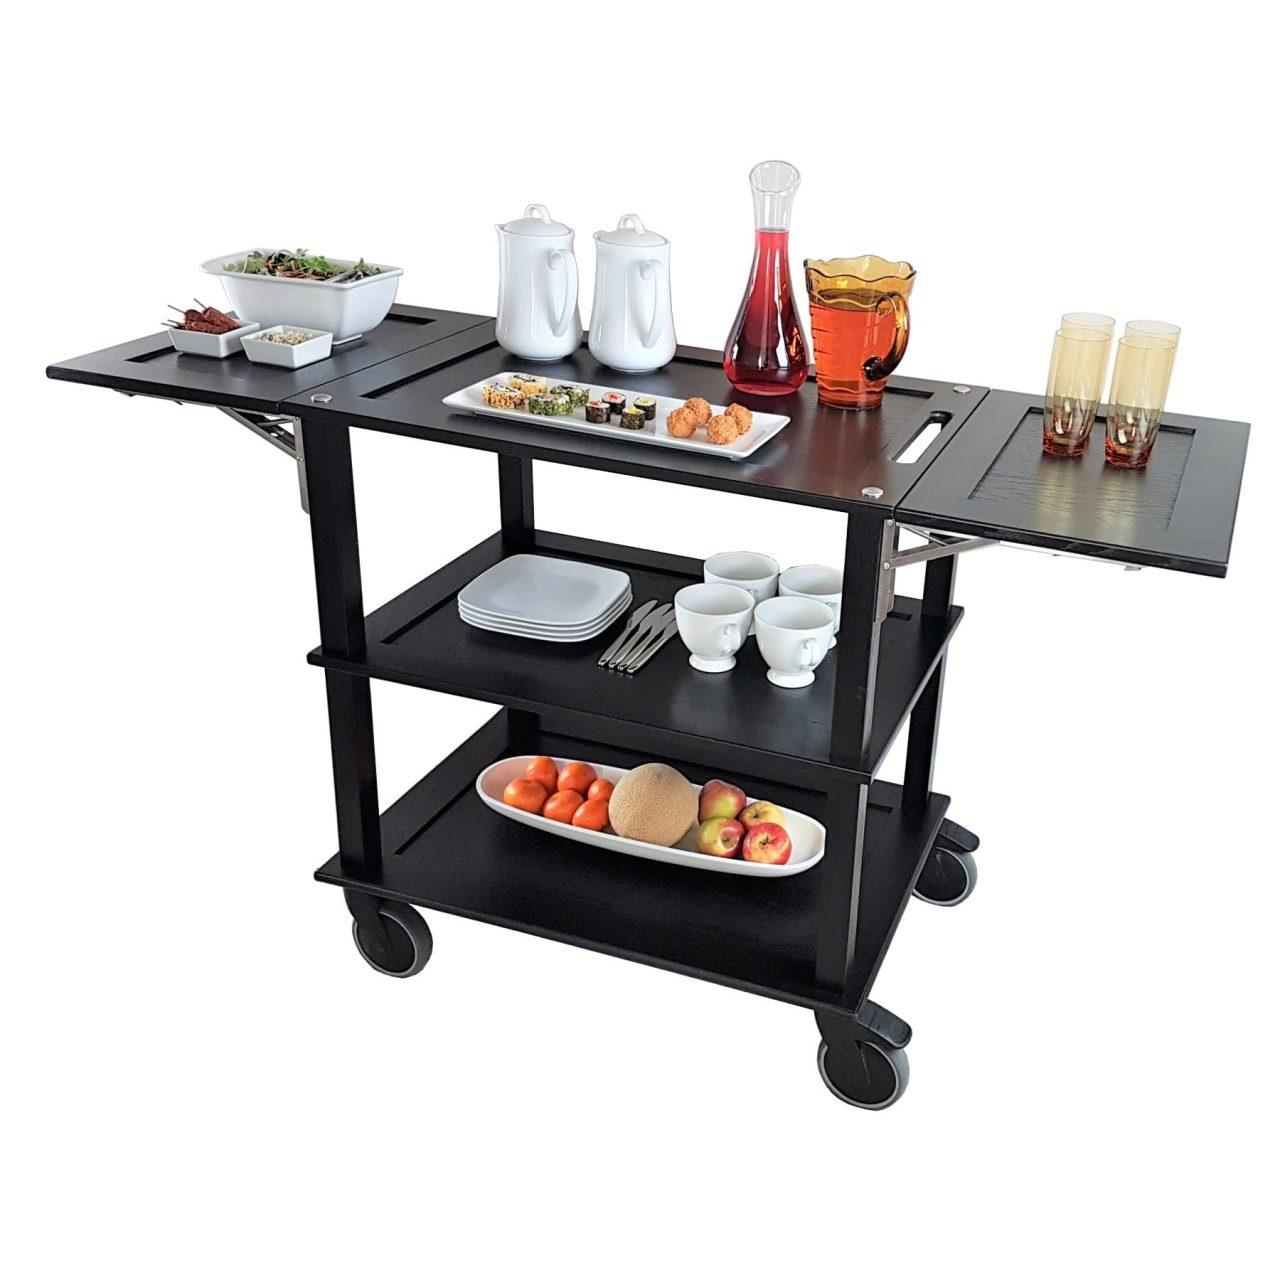 Executive Catering Burford Black Oak Drop Leaf Hospitality Trolley 805-1460x558x855